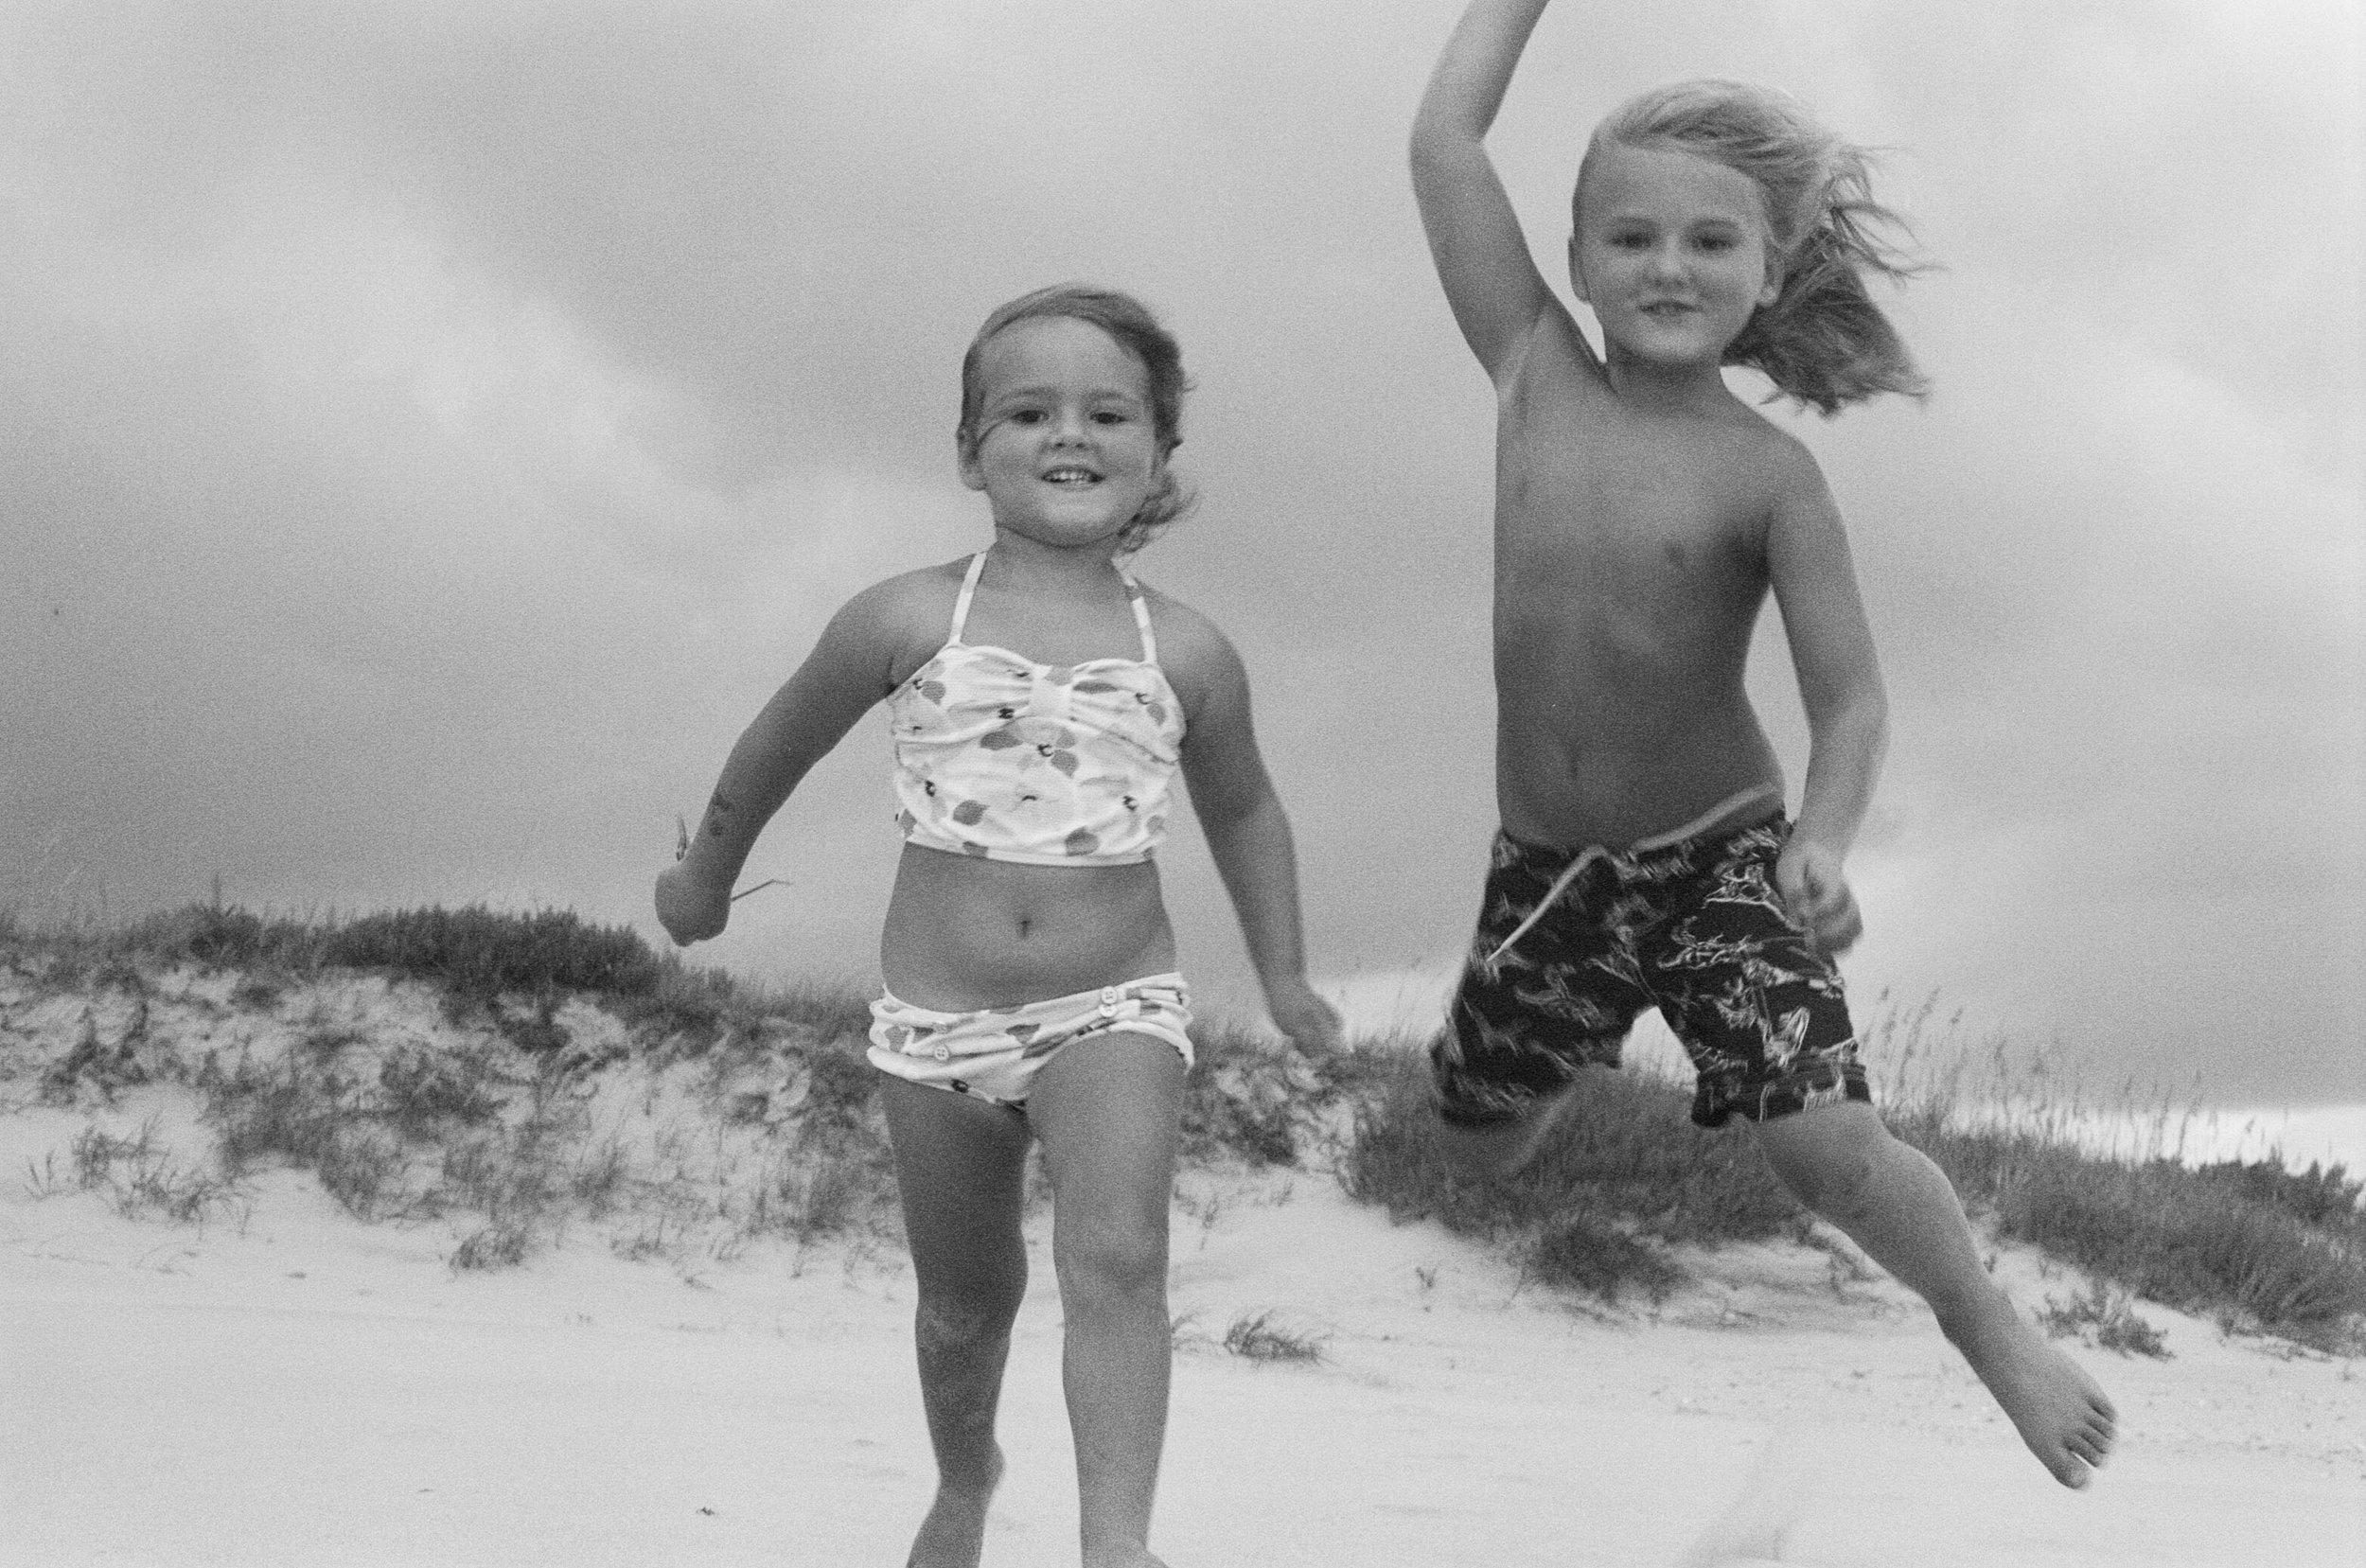 arlo and alamae jumping on the beach.jpg